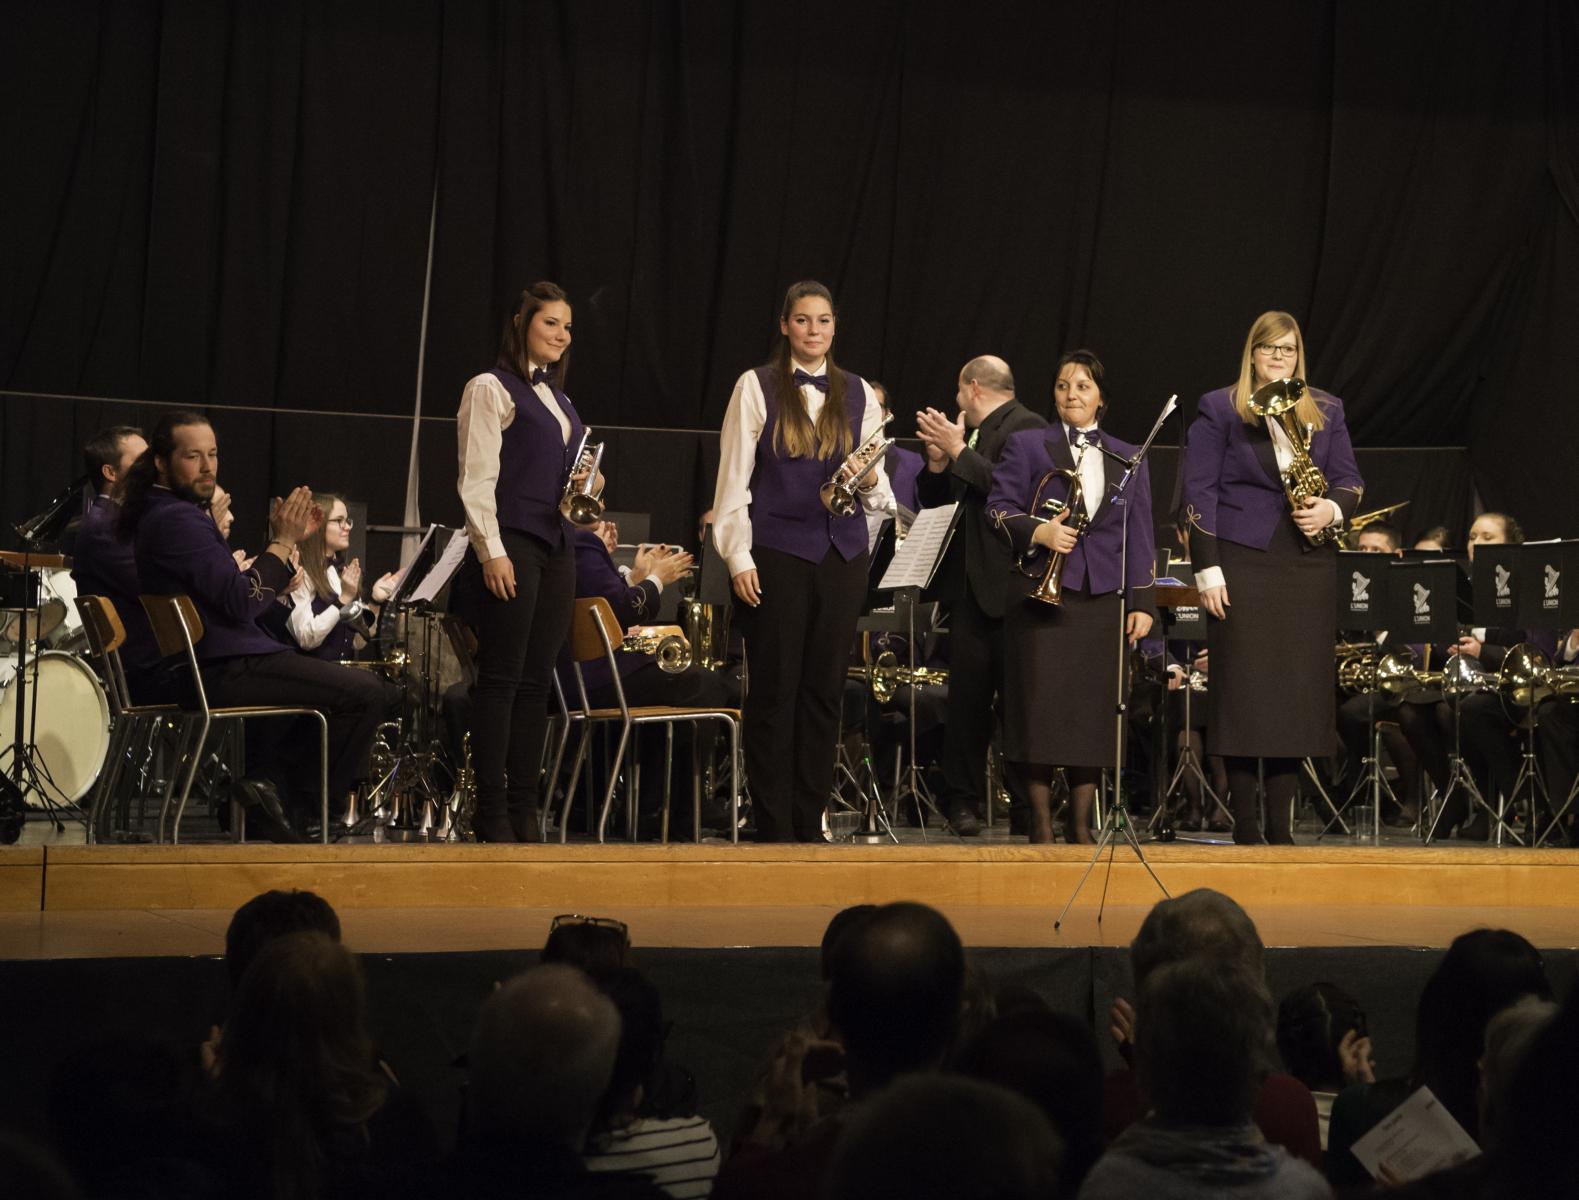 170211_concert_annuel17-055